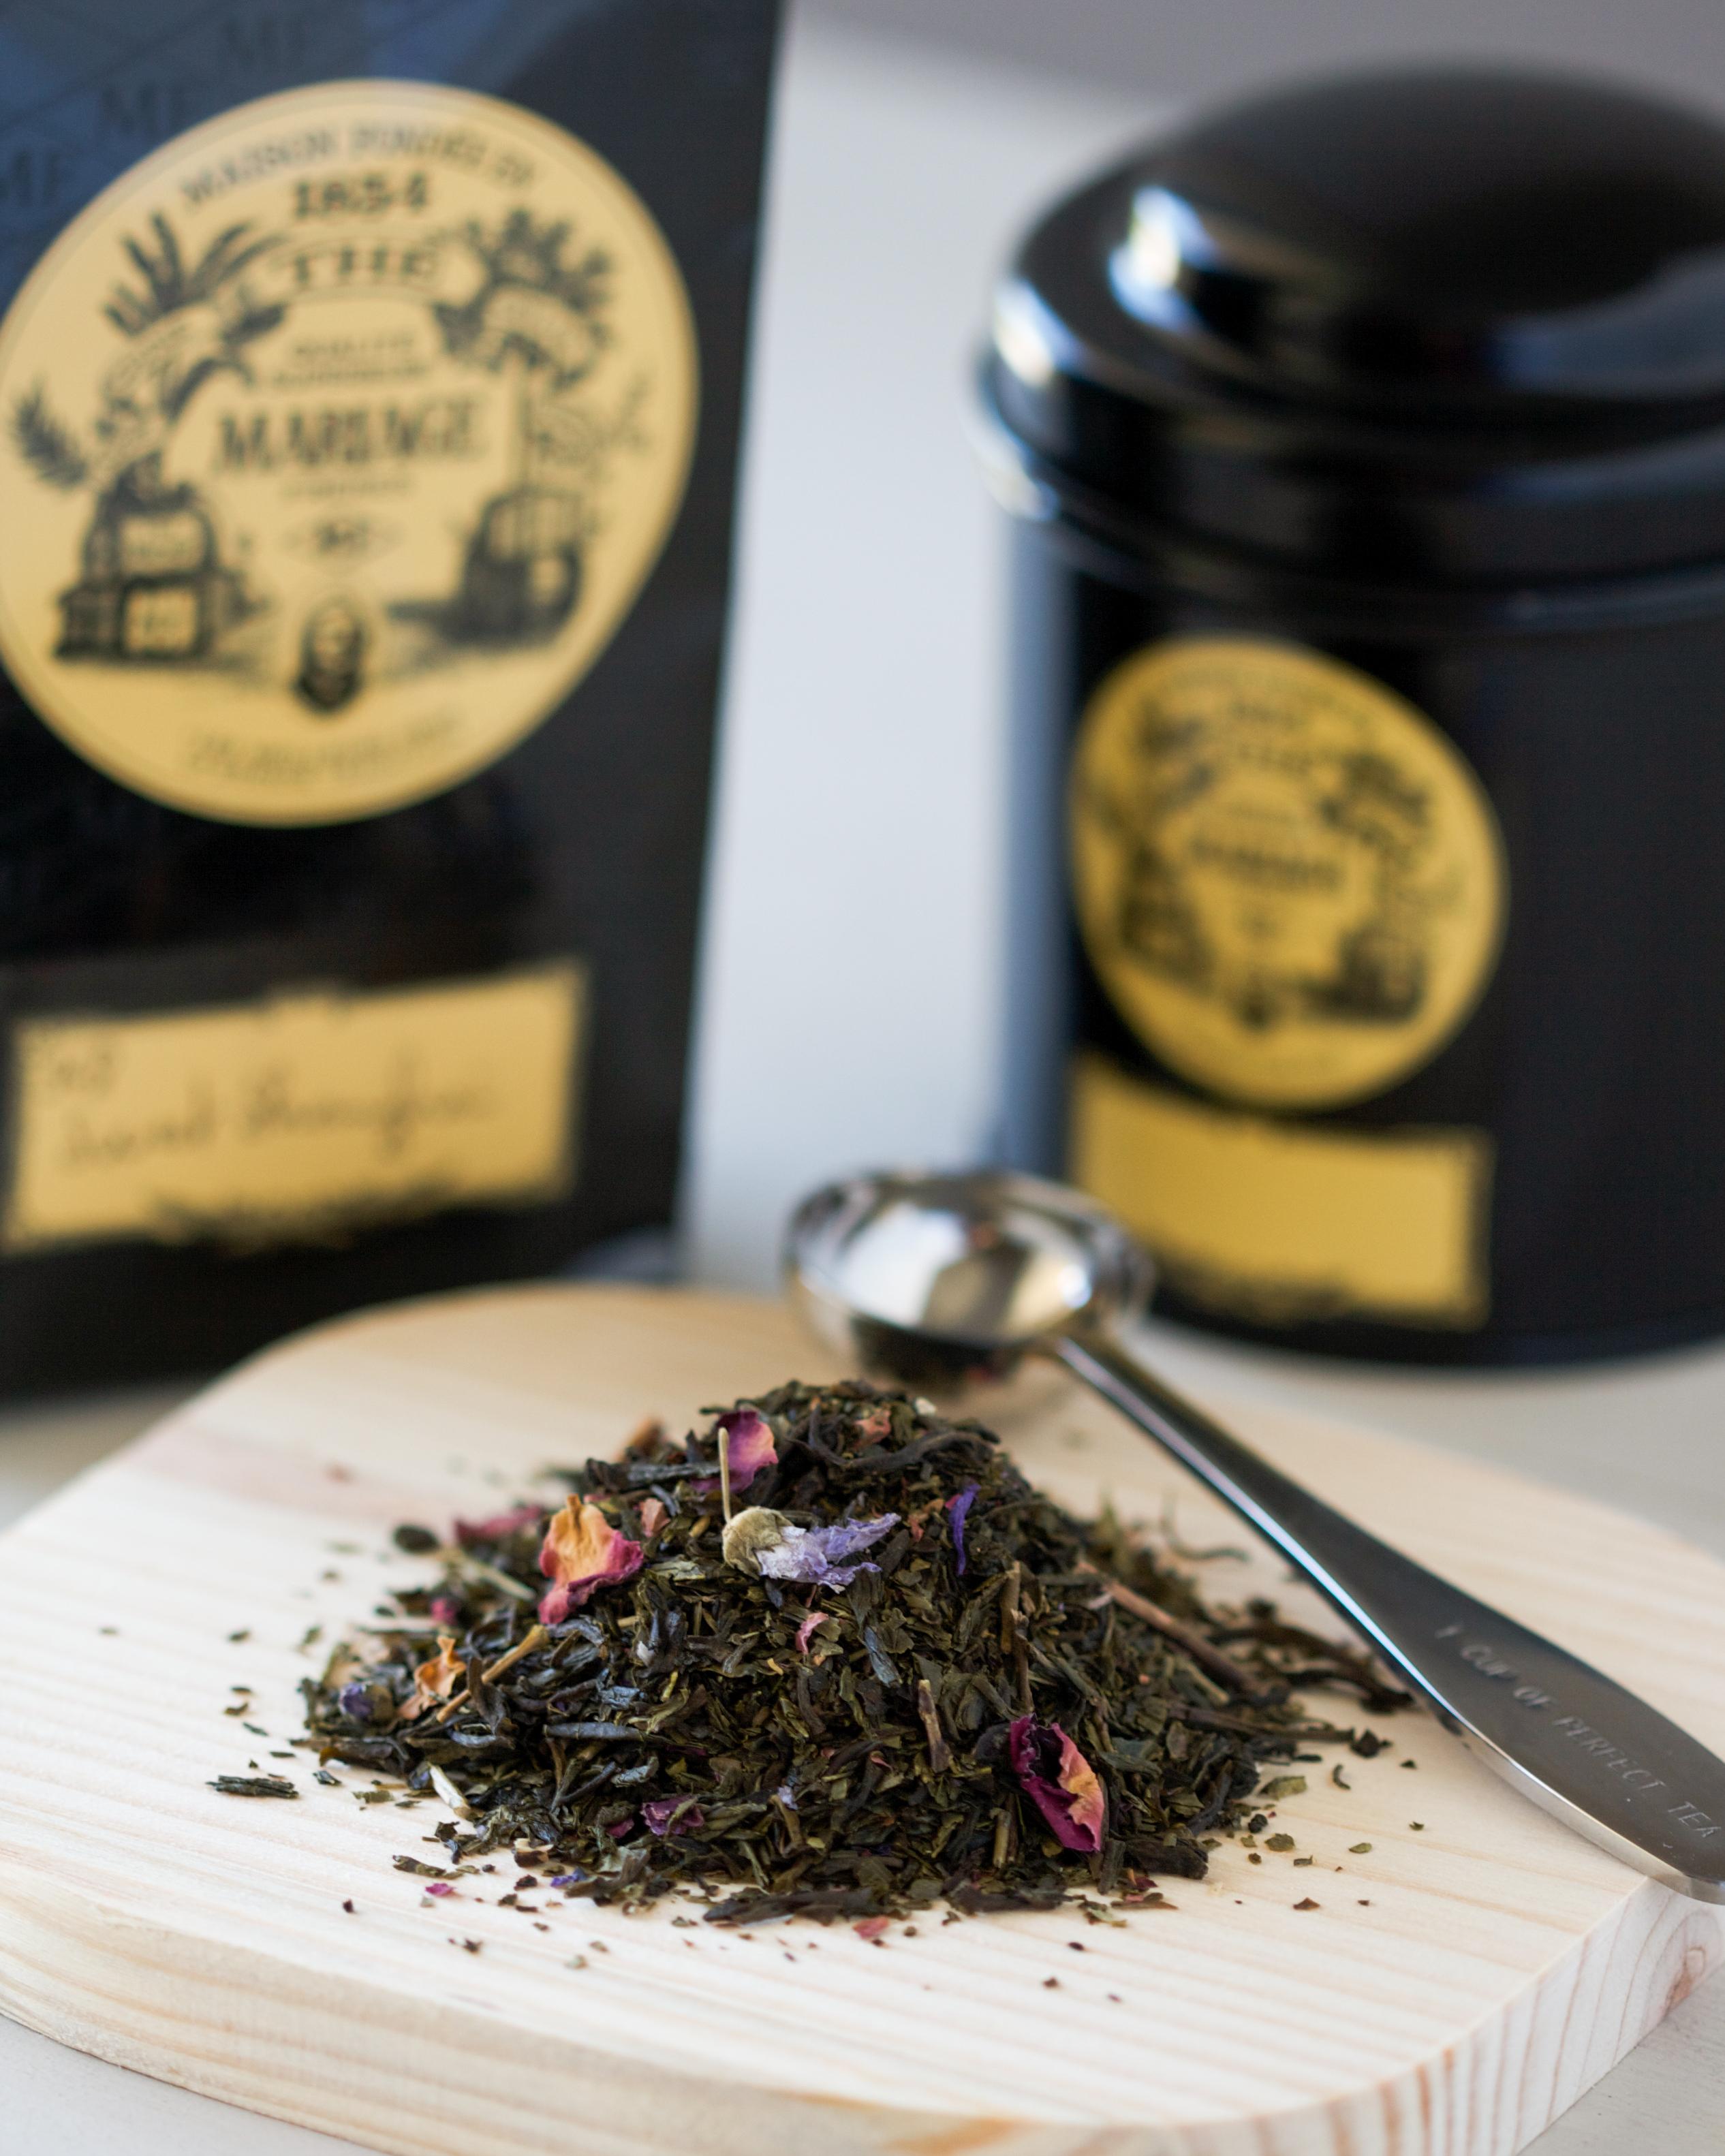 "Mariage Freres ""Sweet Shanghai"" Green Tea Blend"